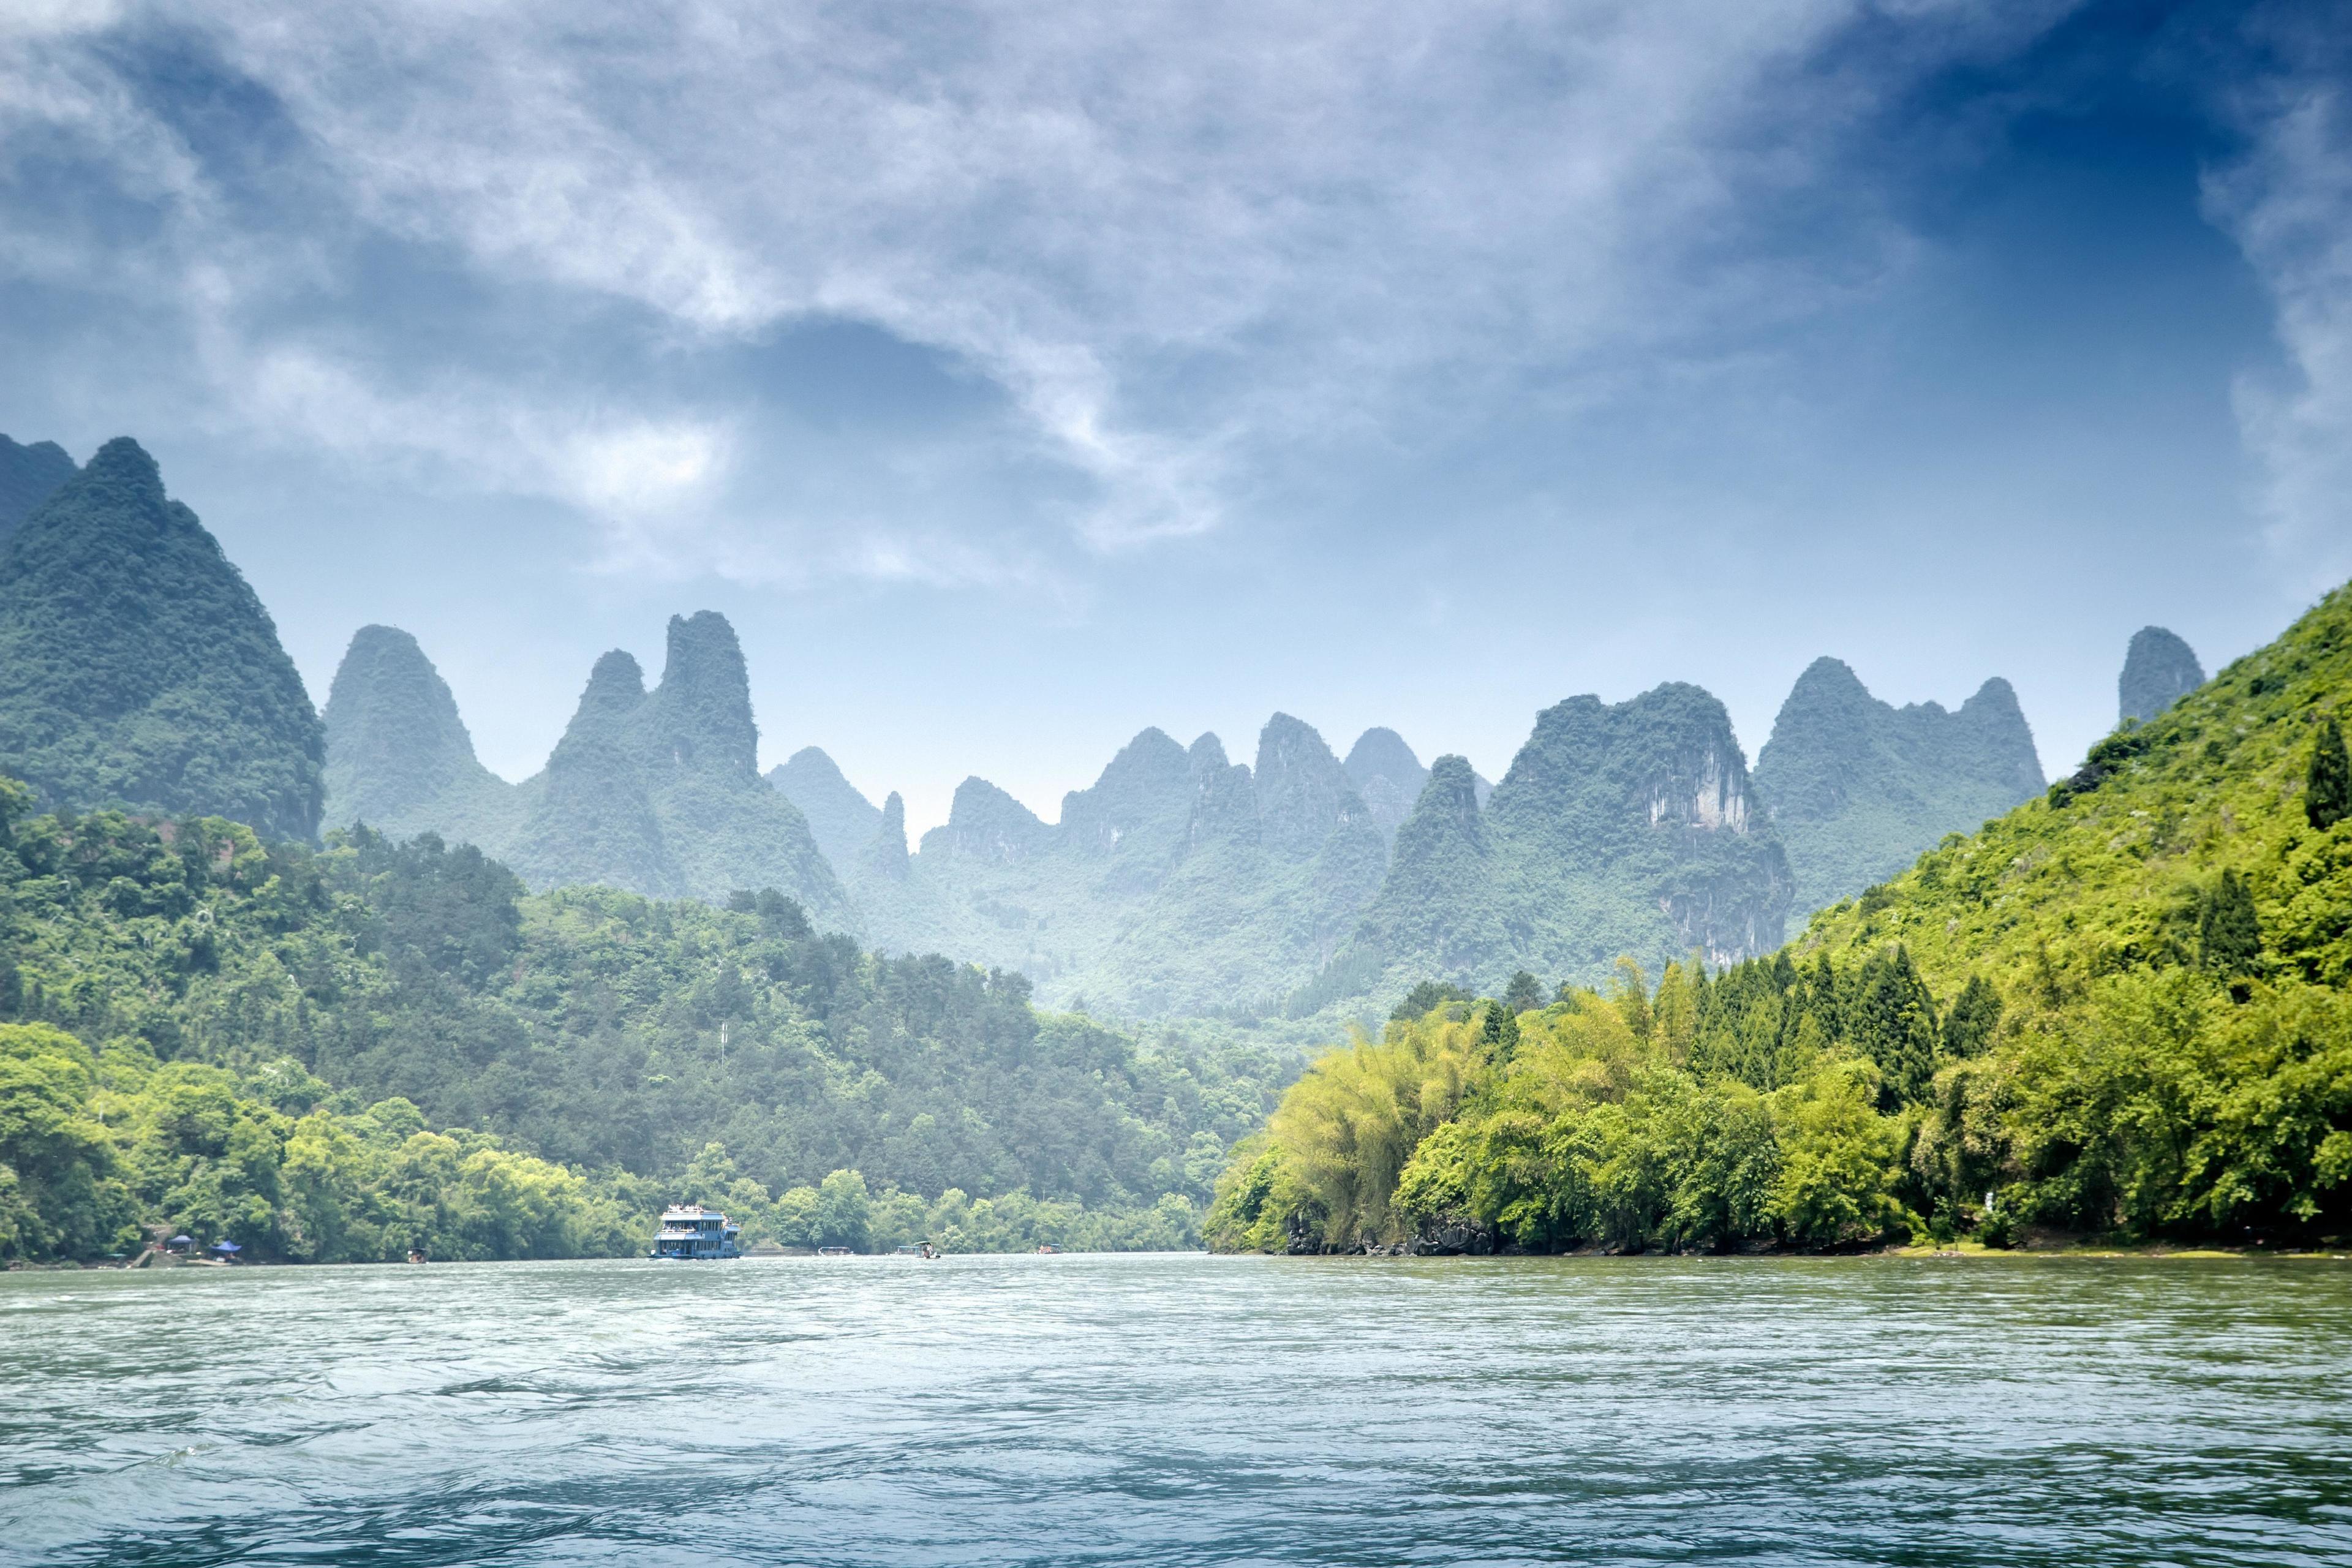 Li River Cruise from Guilin to Yangshuo Day Tour